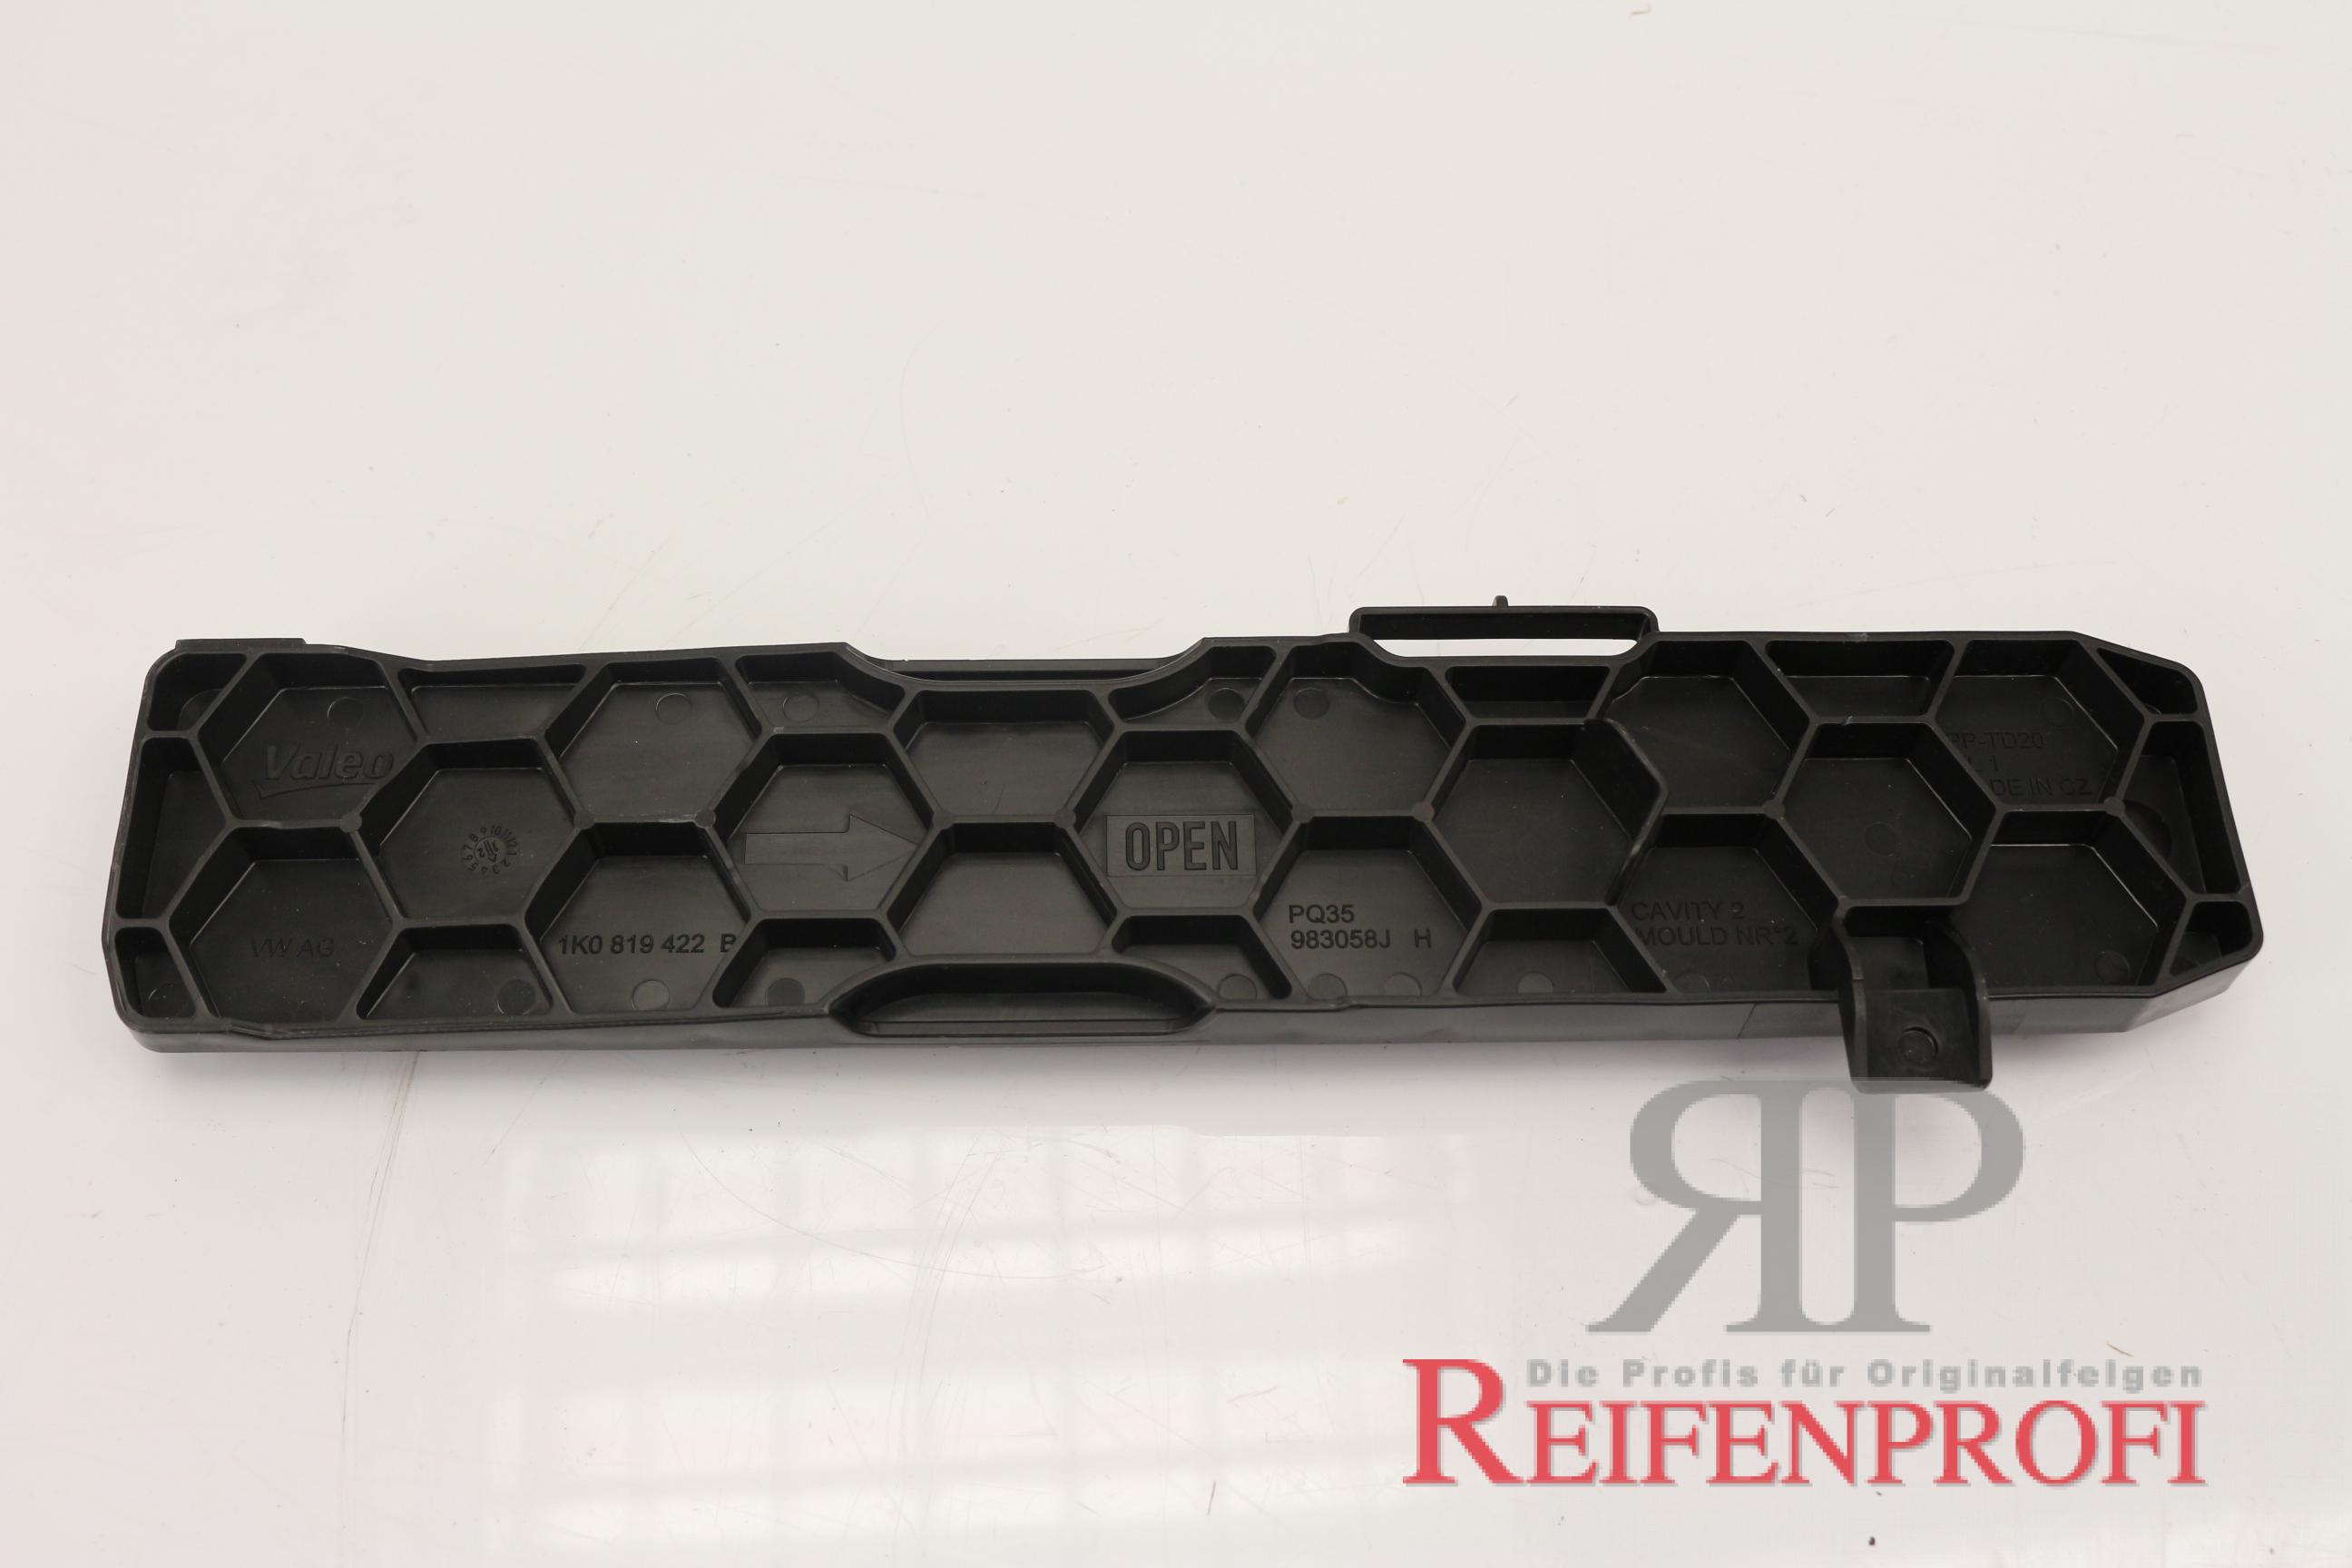 inspektionspakete kits kfz teile kfz teile felgen. Black Bedroom Furniture Sets. Home Design Ideas